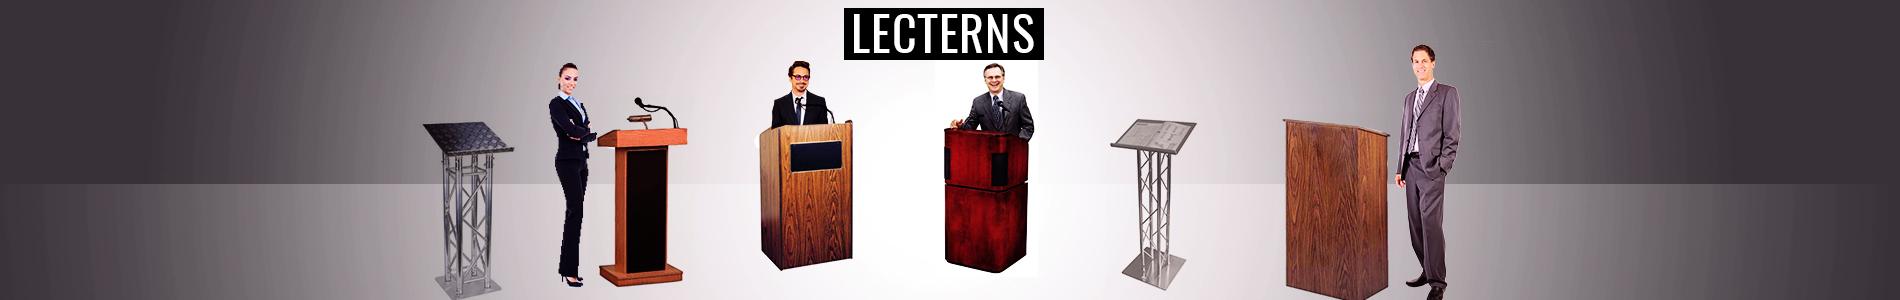 Lecterns